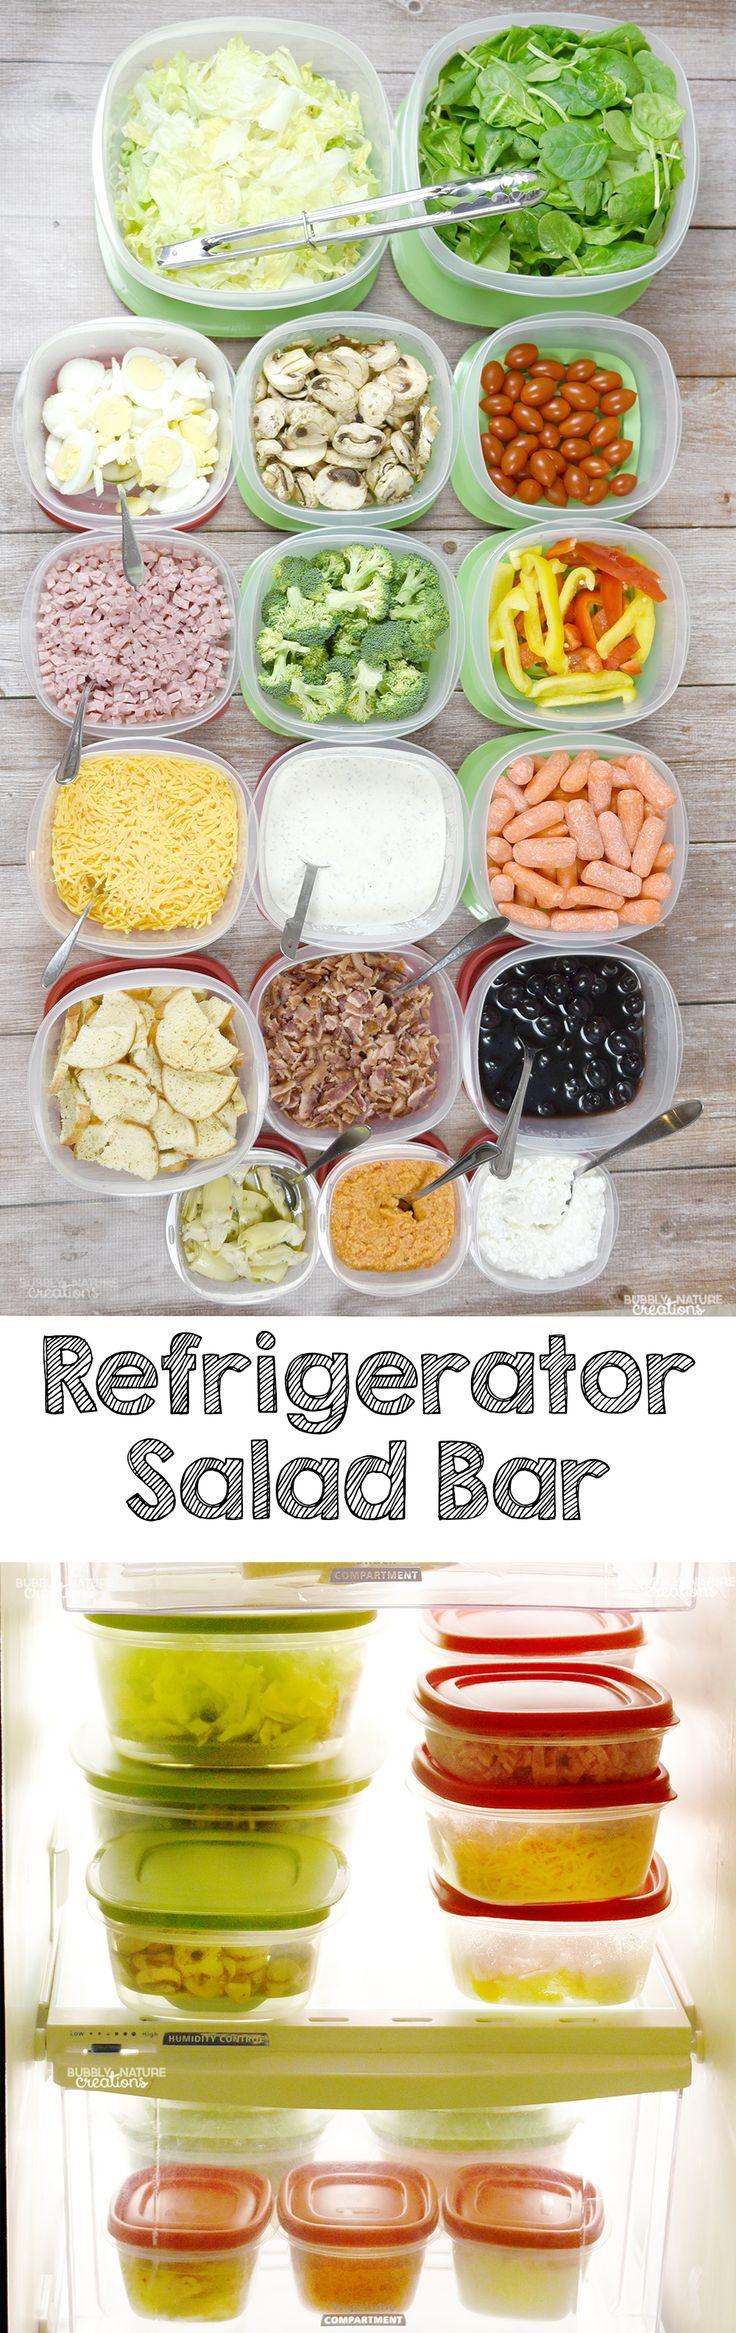 Refrigerator Hacks to Help You Eat More Fruits and Veggies! I love this DIY Refrigerator Salad Bar.